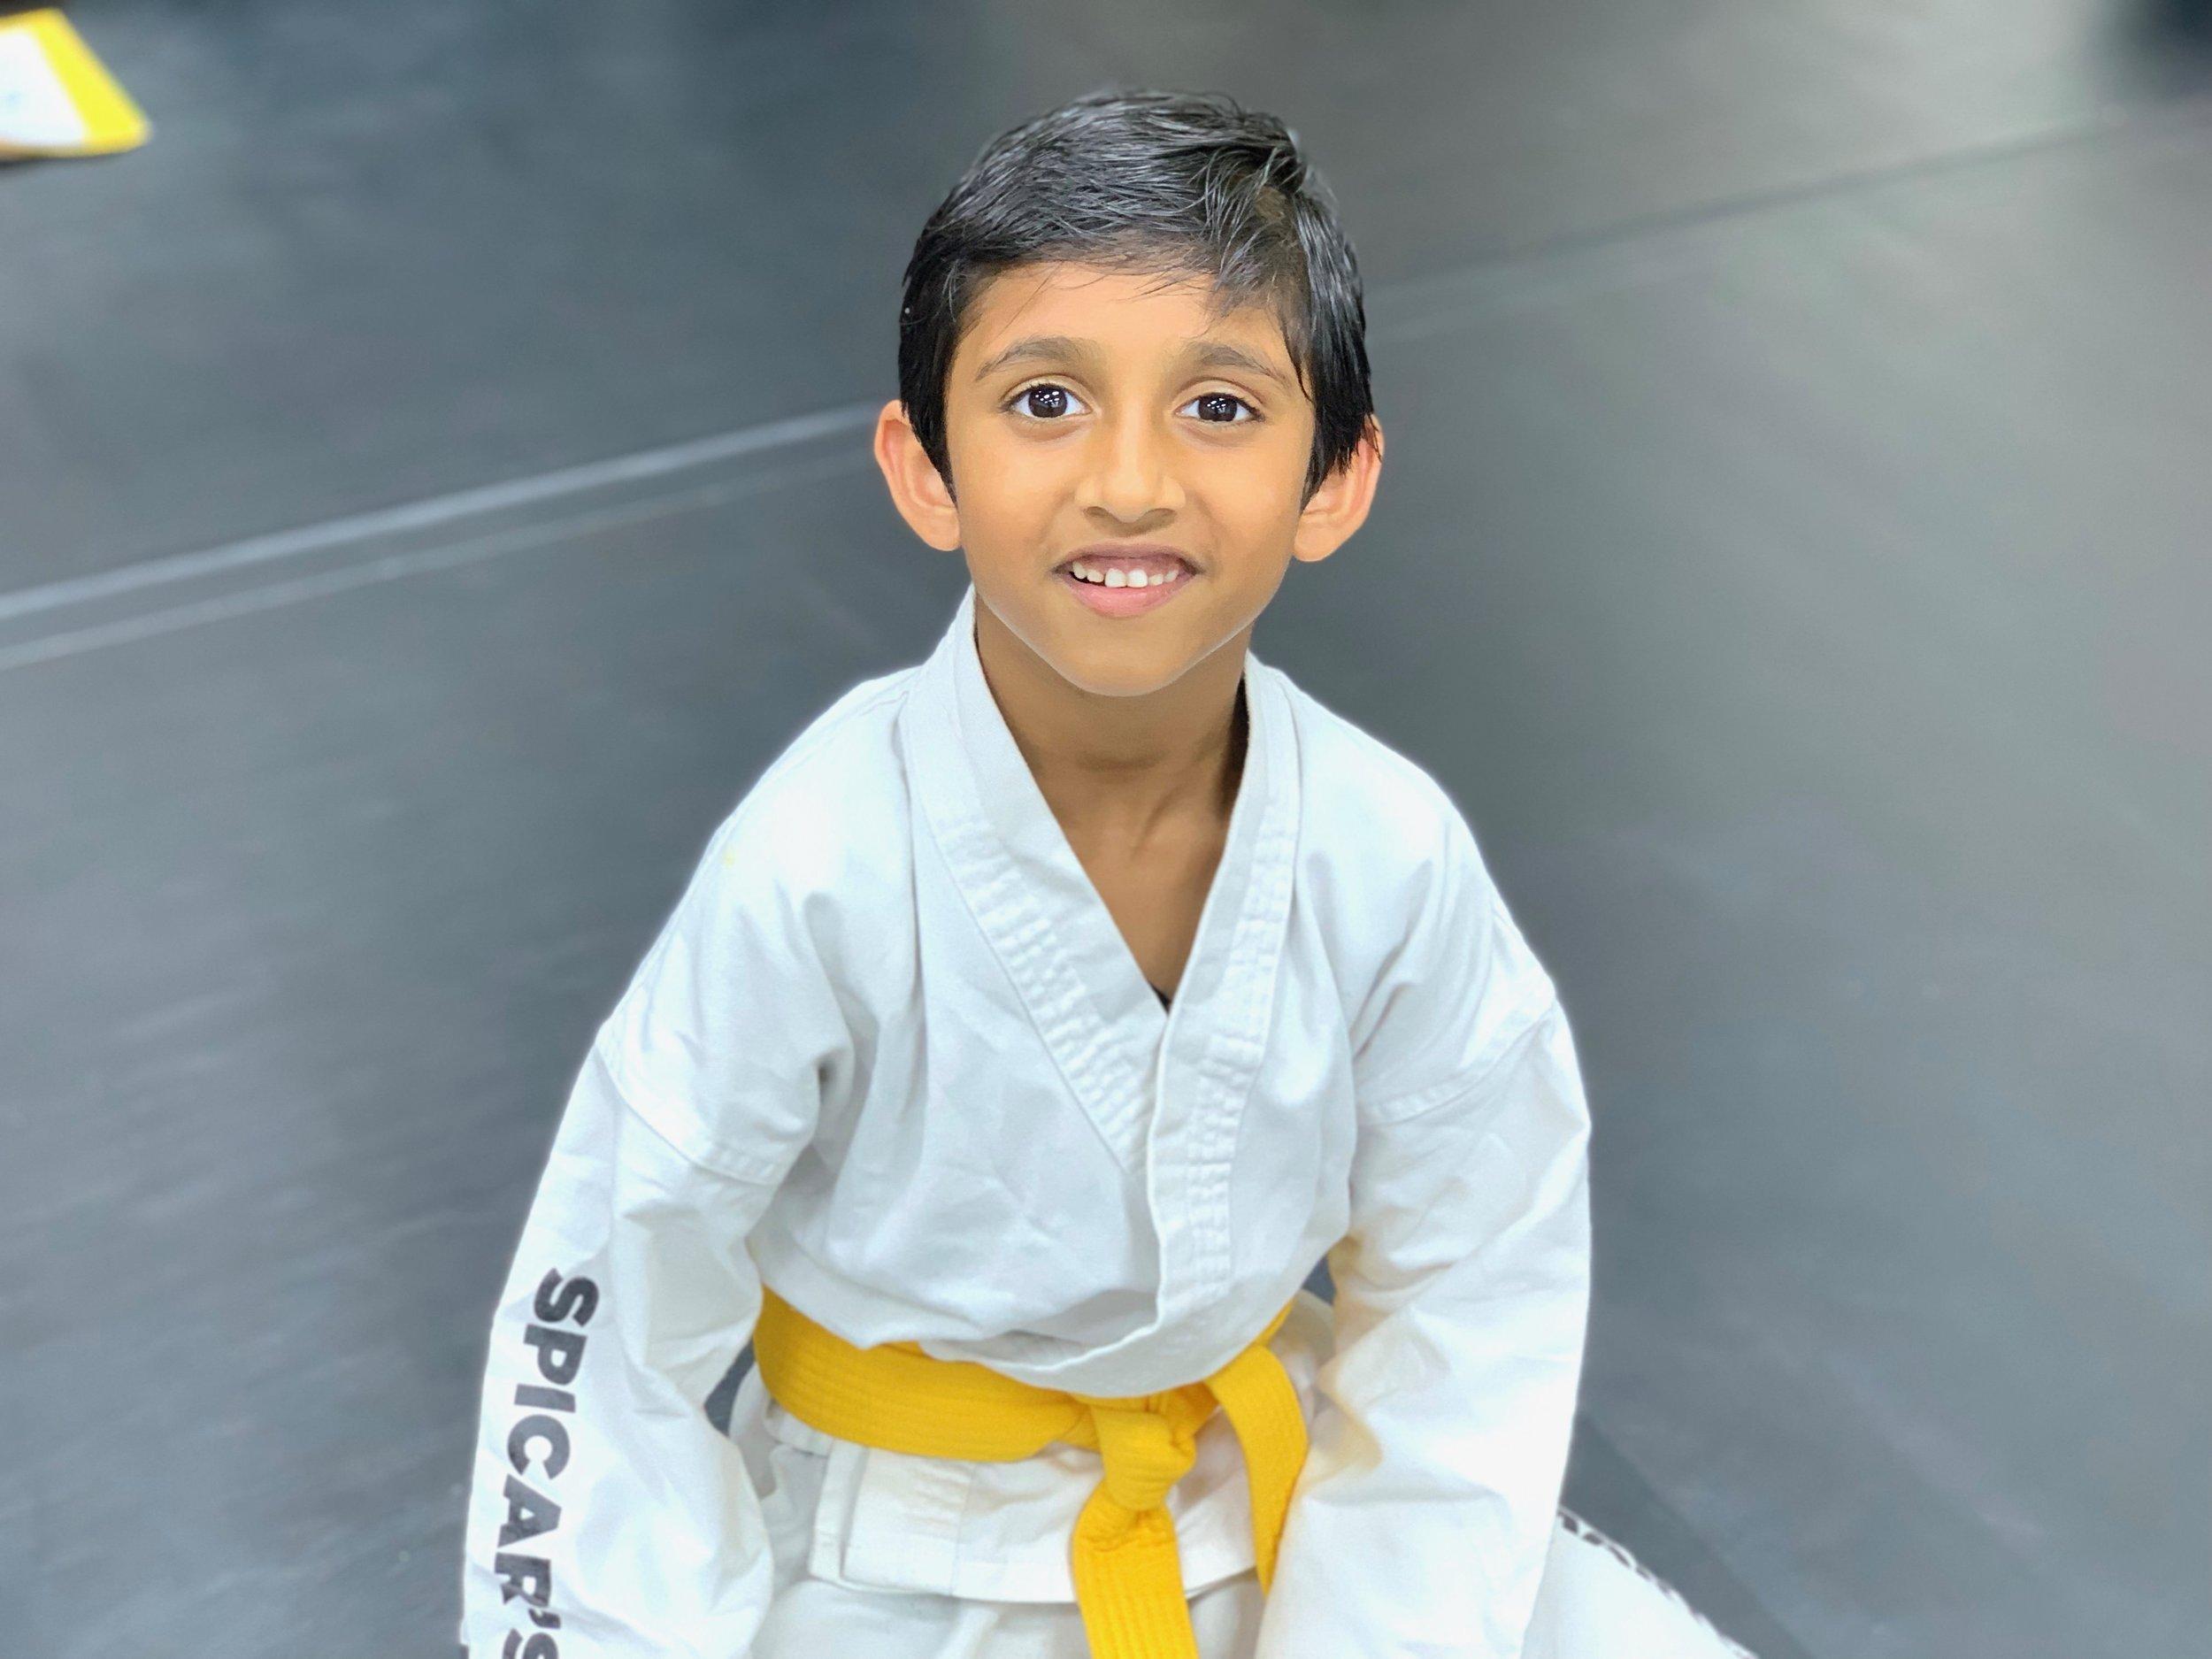 karate-kids-program-souhtlake-keller-grapevine-texas00005.jpeg